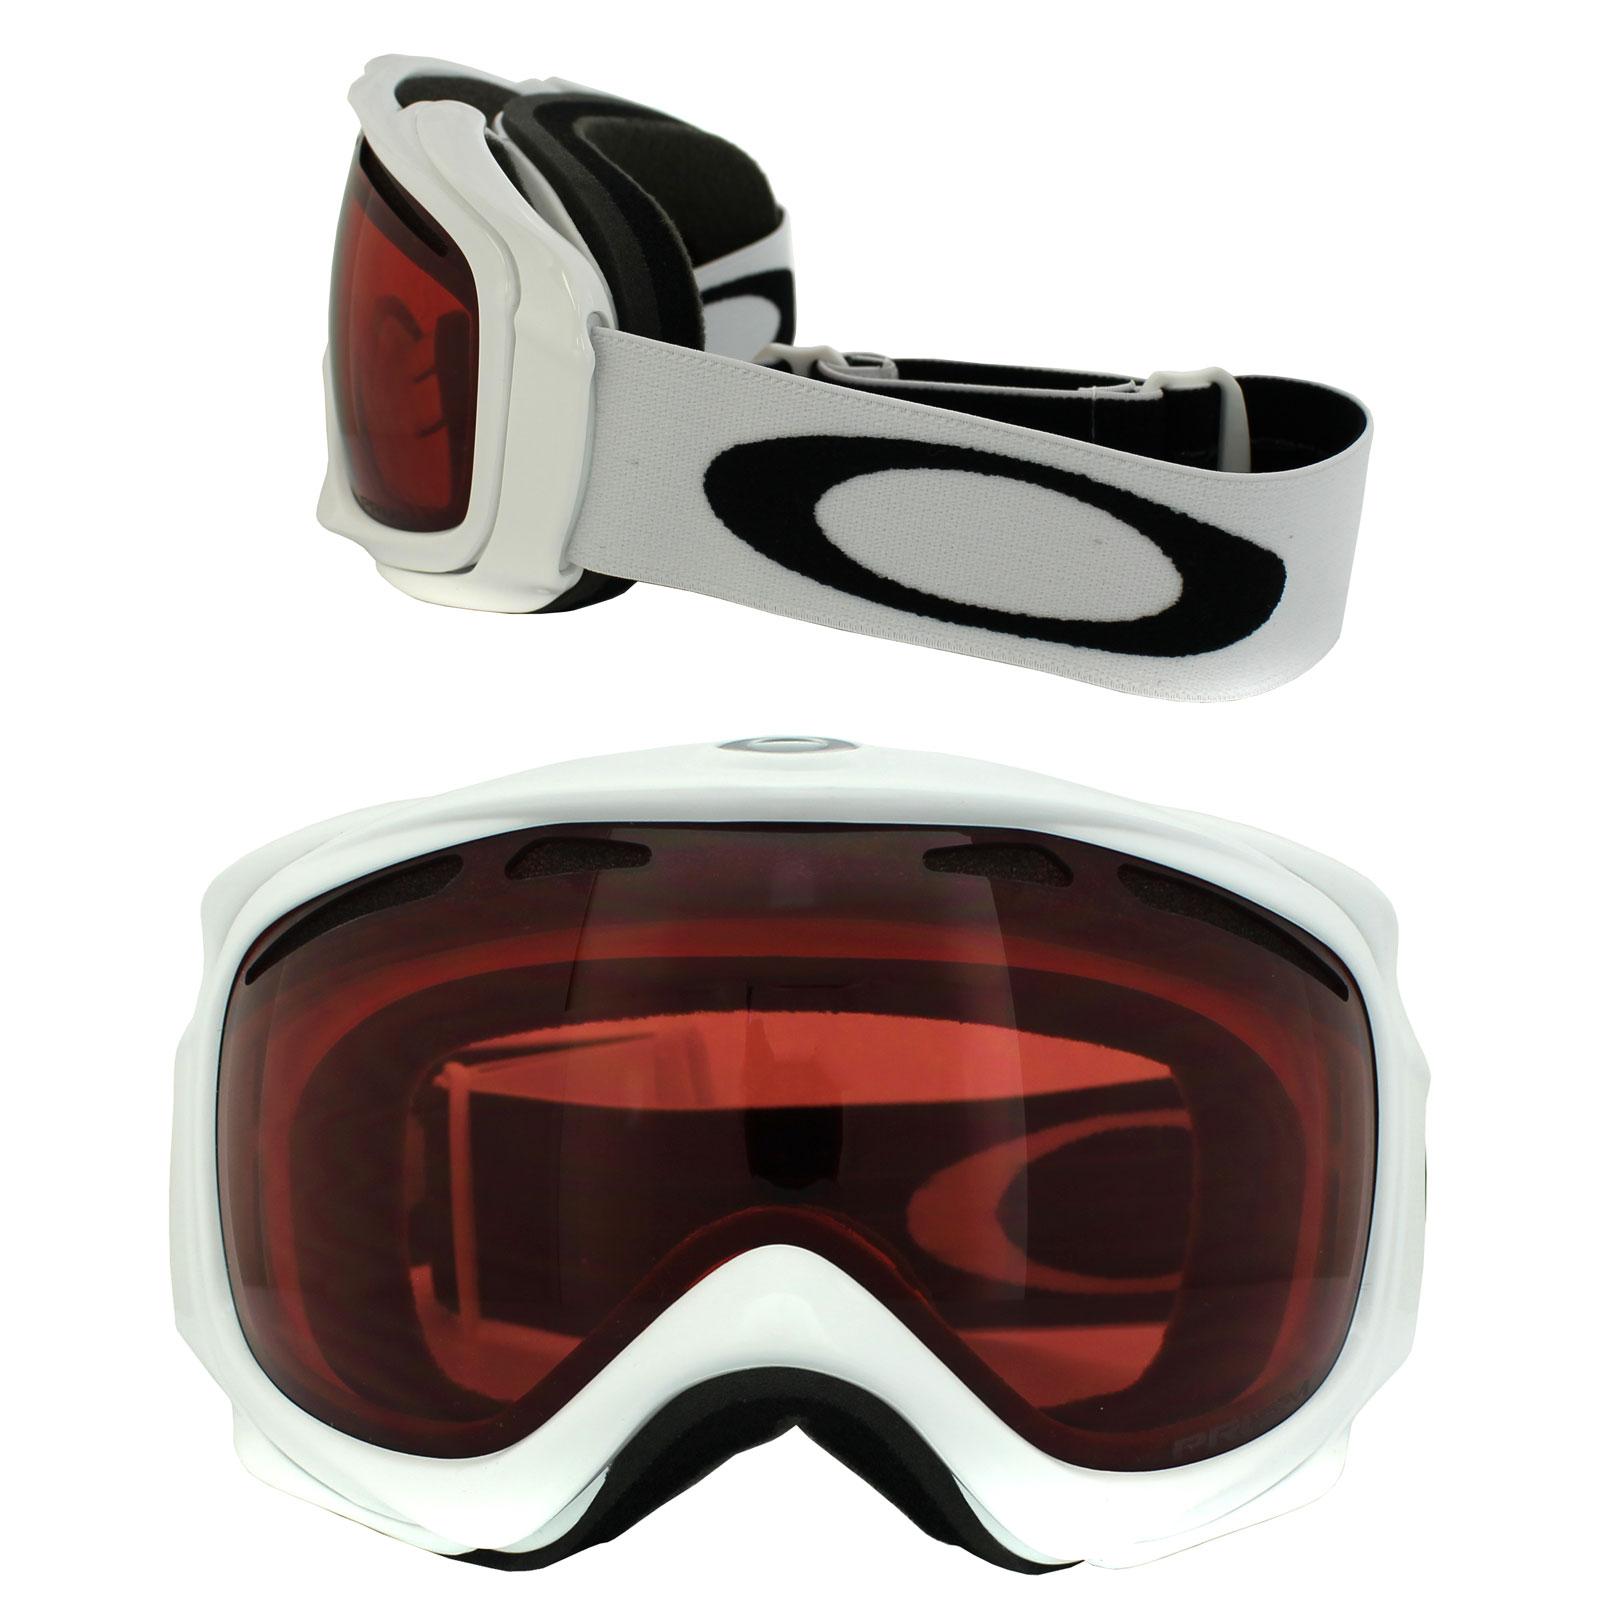 oakley elevate goggles 5bey  Oakley Elevate Goggles Thumbnail 1 Oakley Elevate Goggles Thumbnail 2